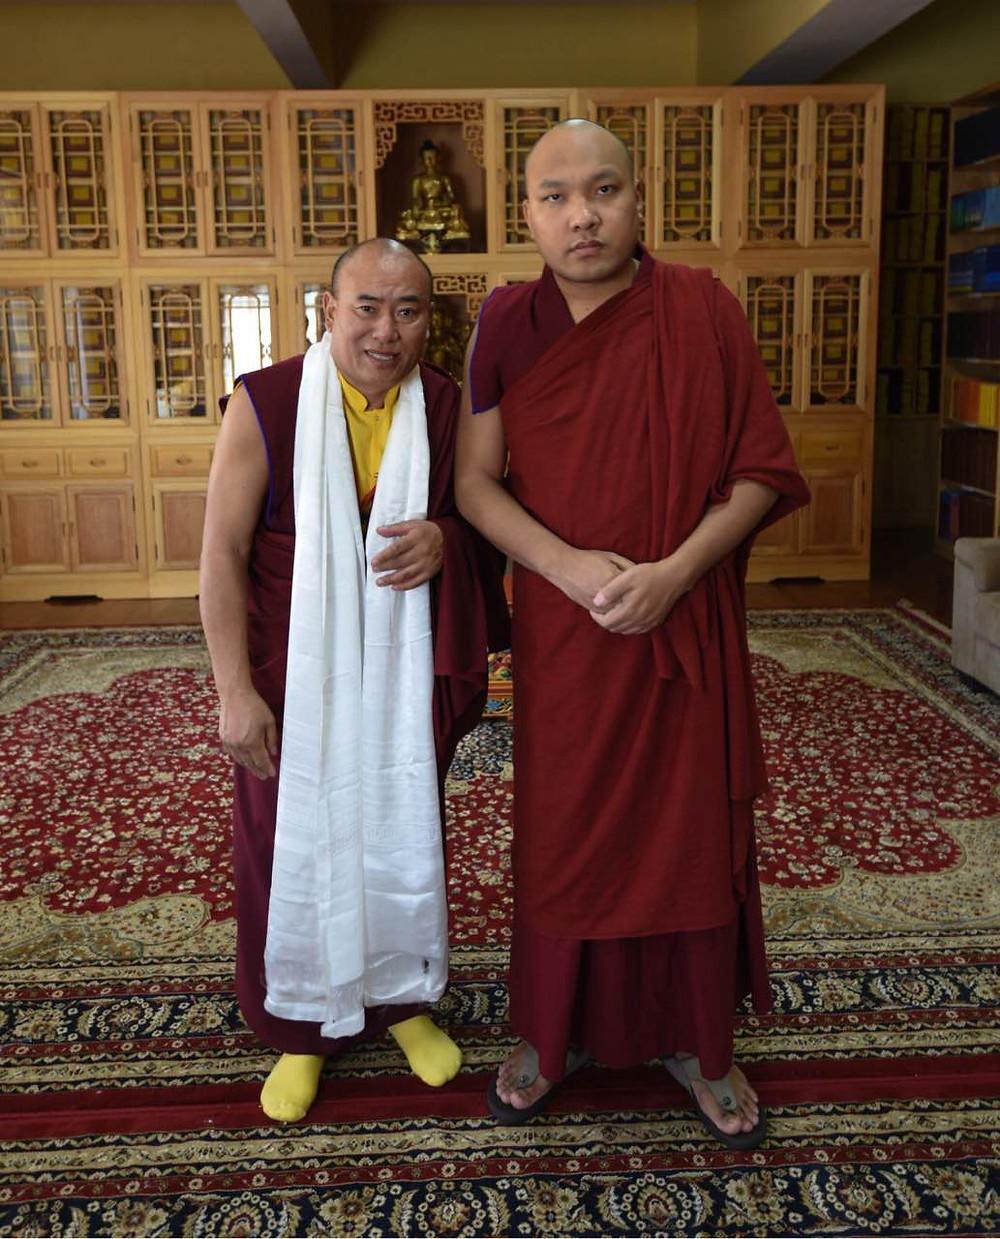 His Holiness Karmapa 17th & Lama Dawa (Our Guru)